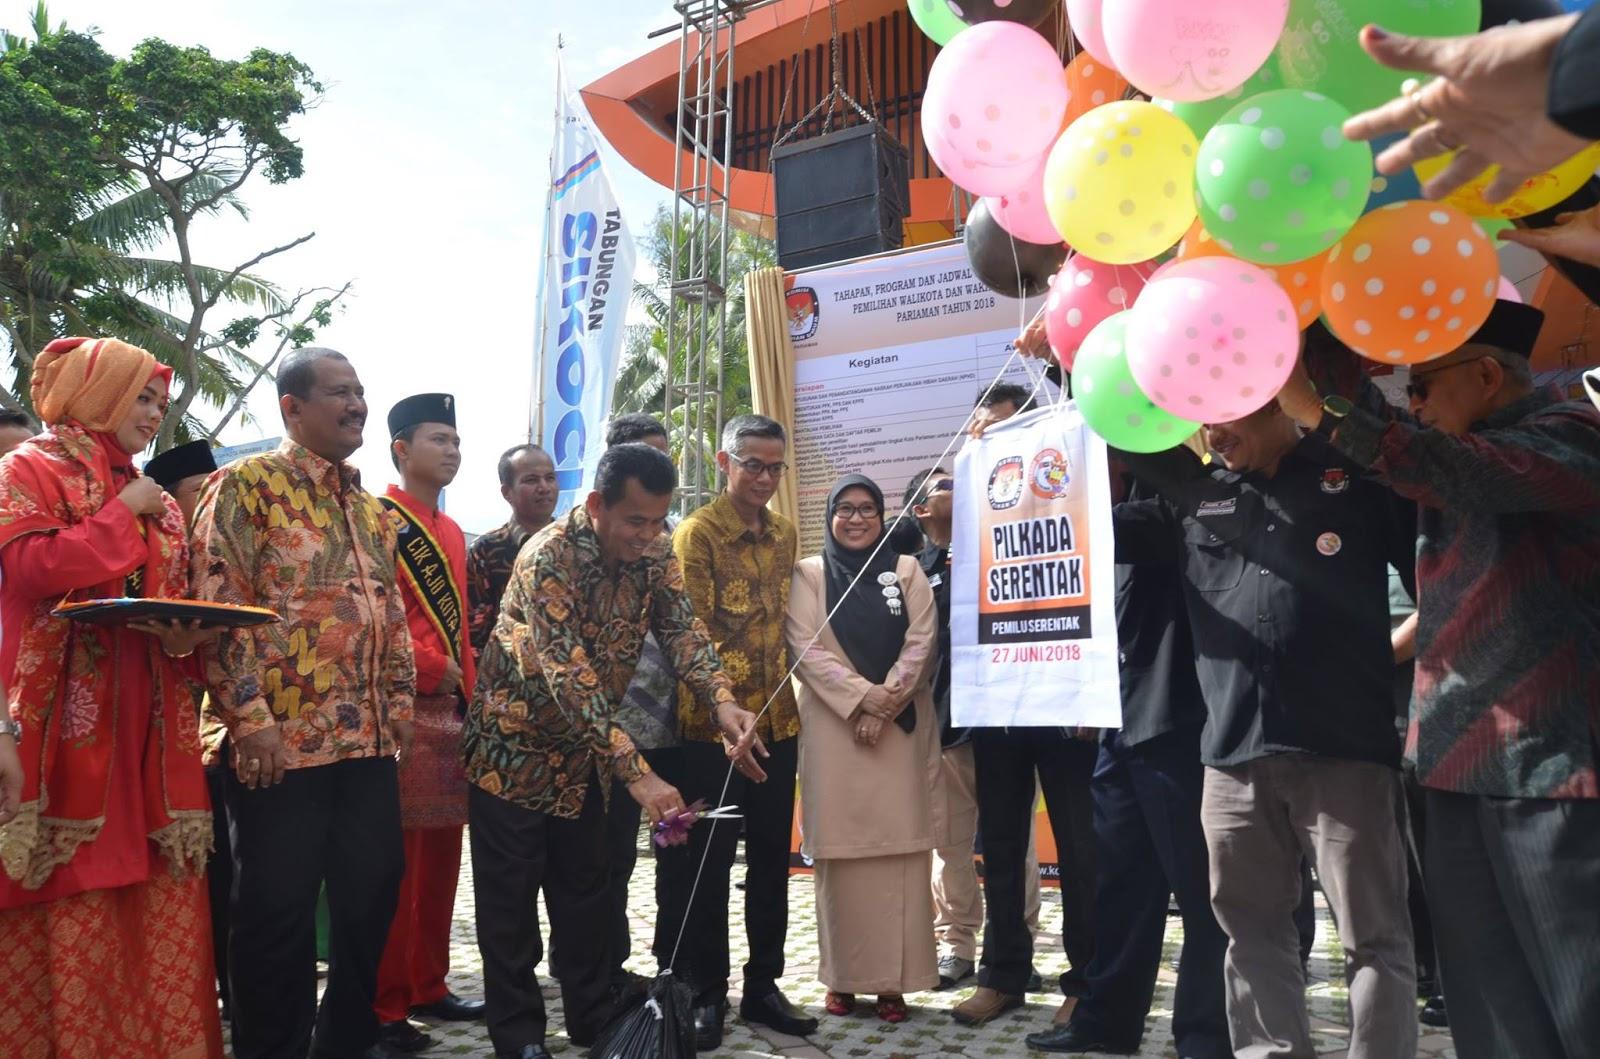 KPU Kota Pariaman Luncurkan Tahapan Pemilihan Walikota dan Wakil Walikota tahun 2018